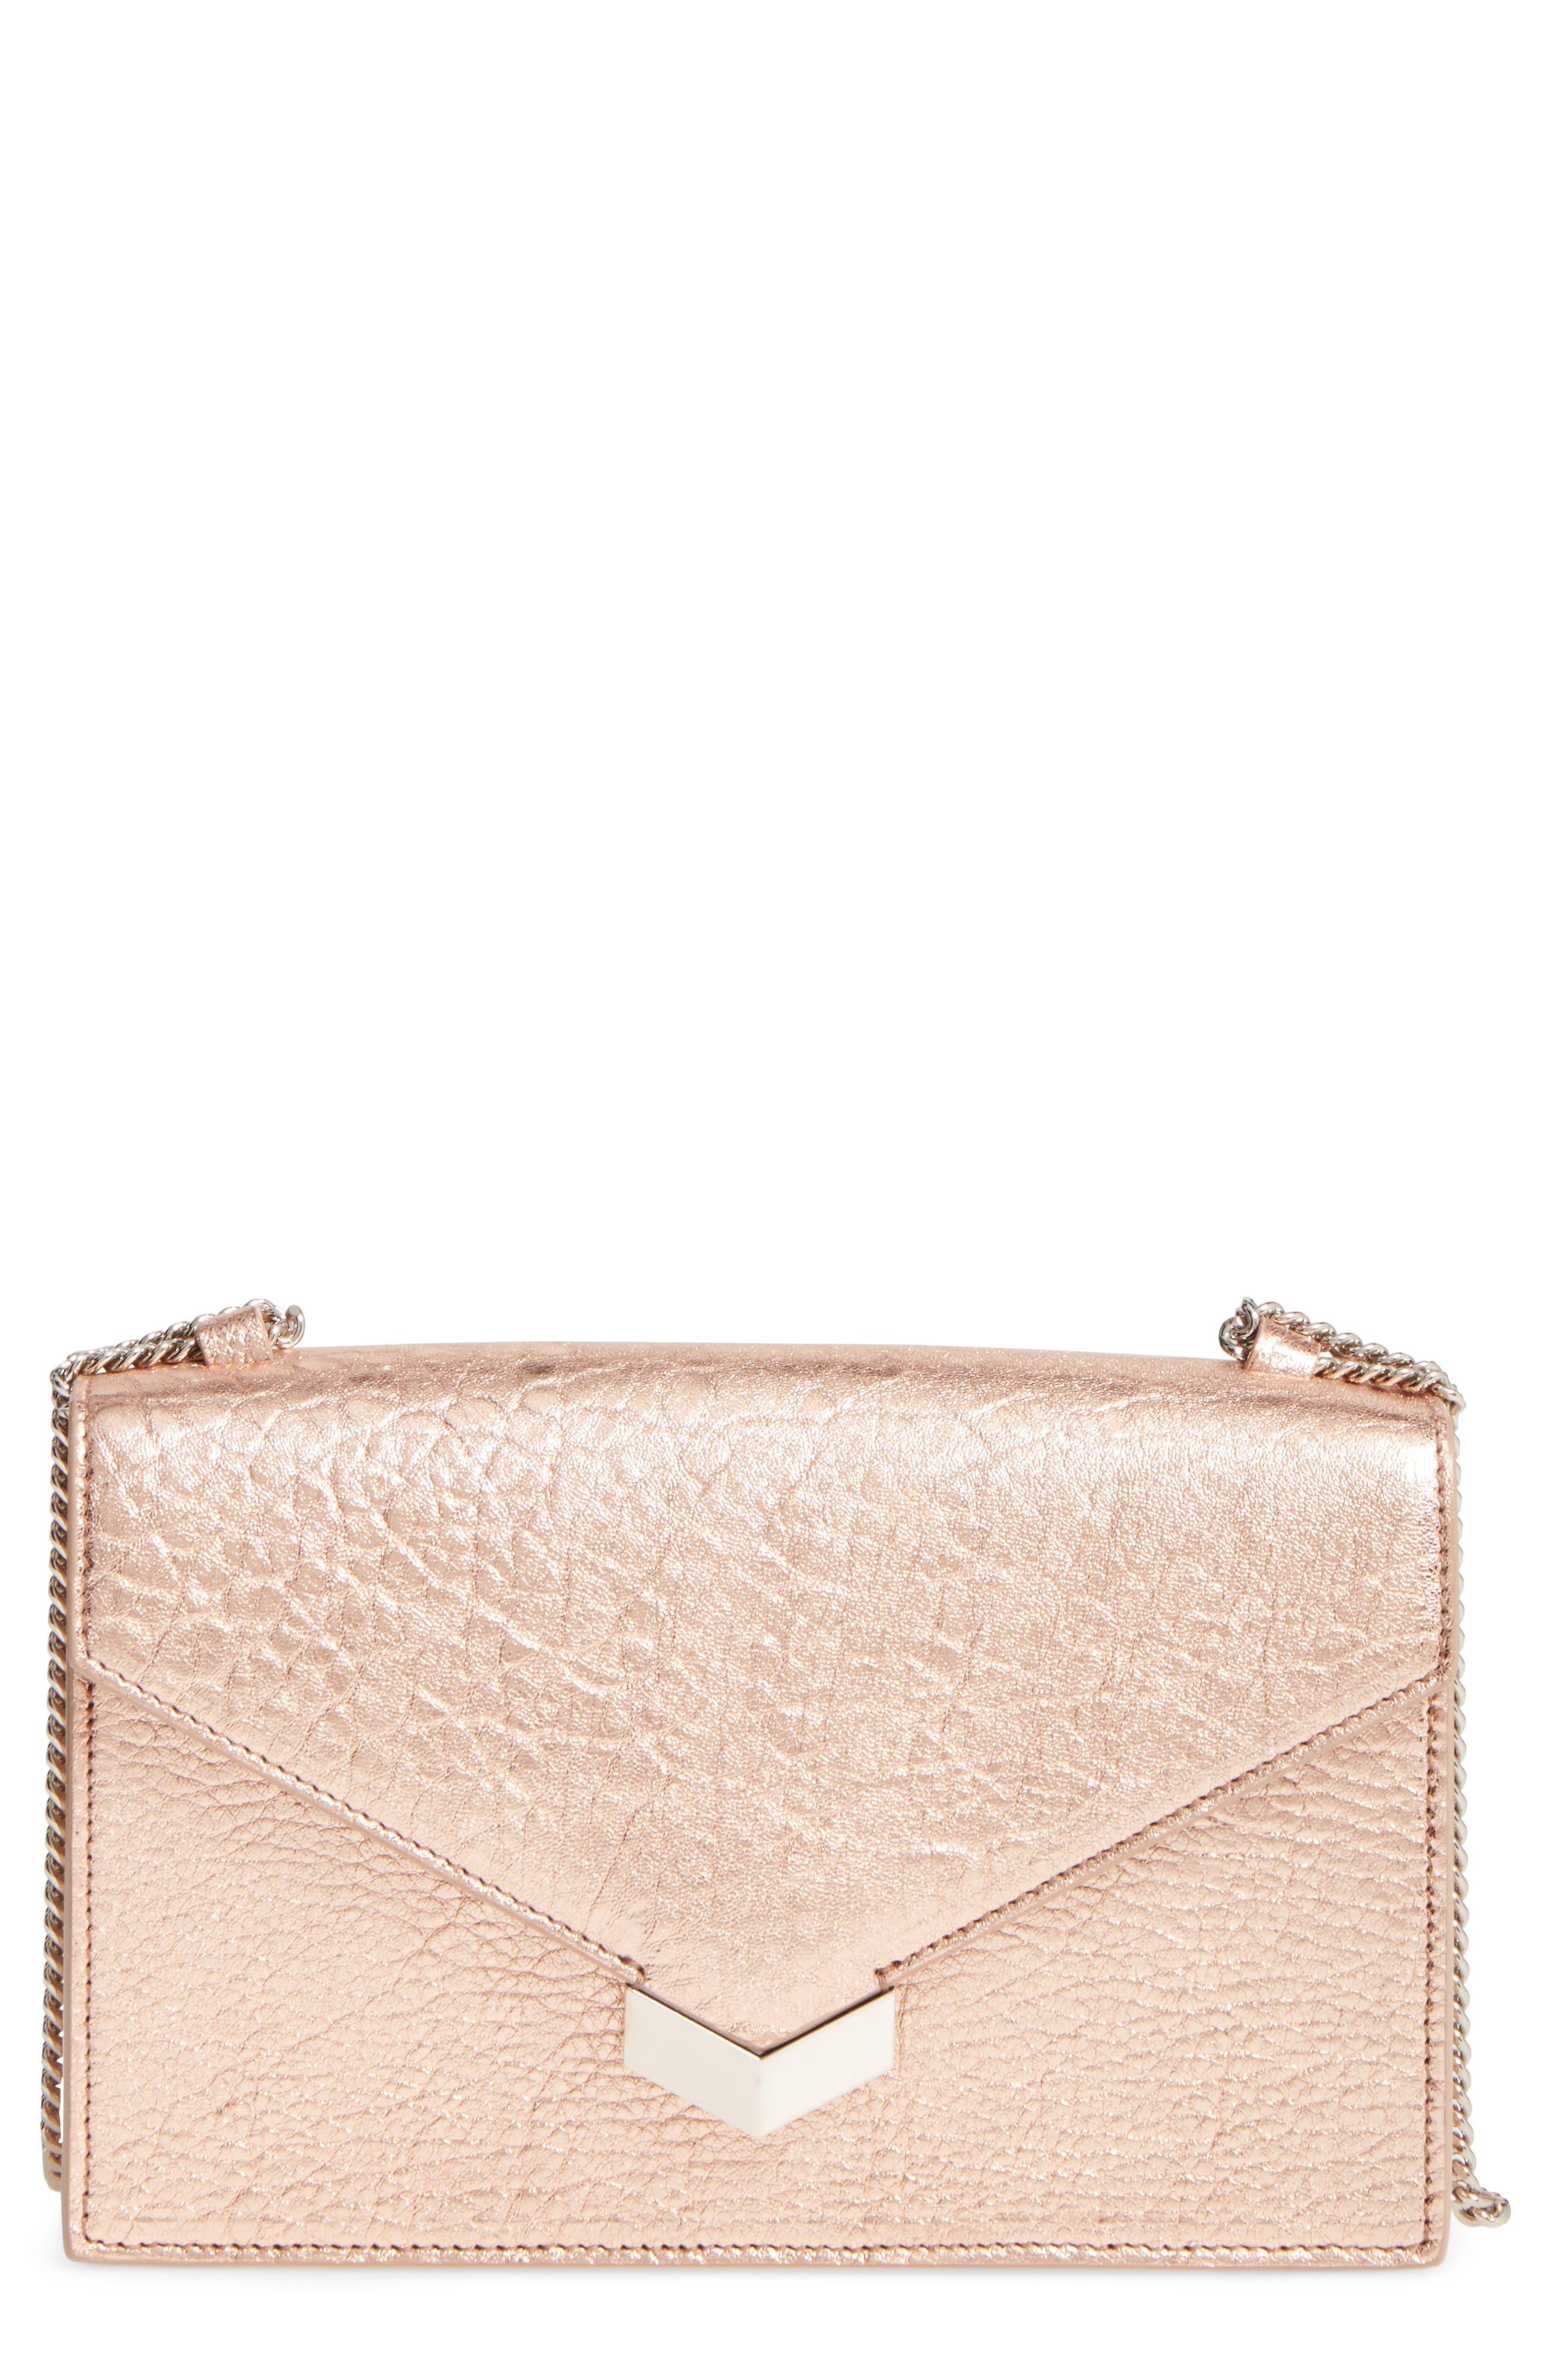 Main Image - Jimmy Choo Leila Grainy Lambskin Leather Crossbody Bag